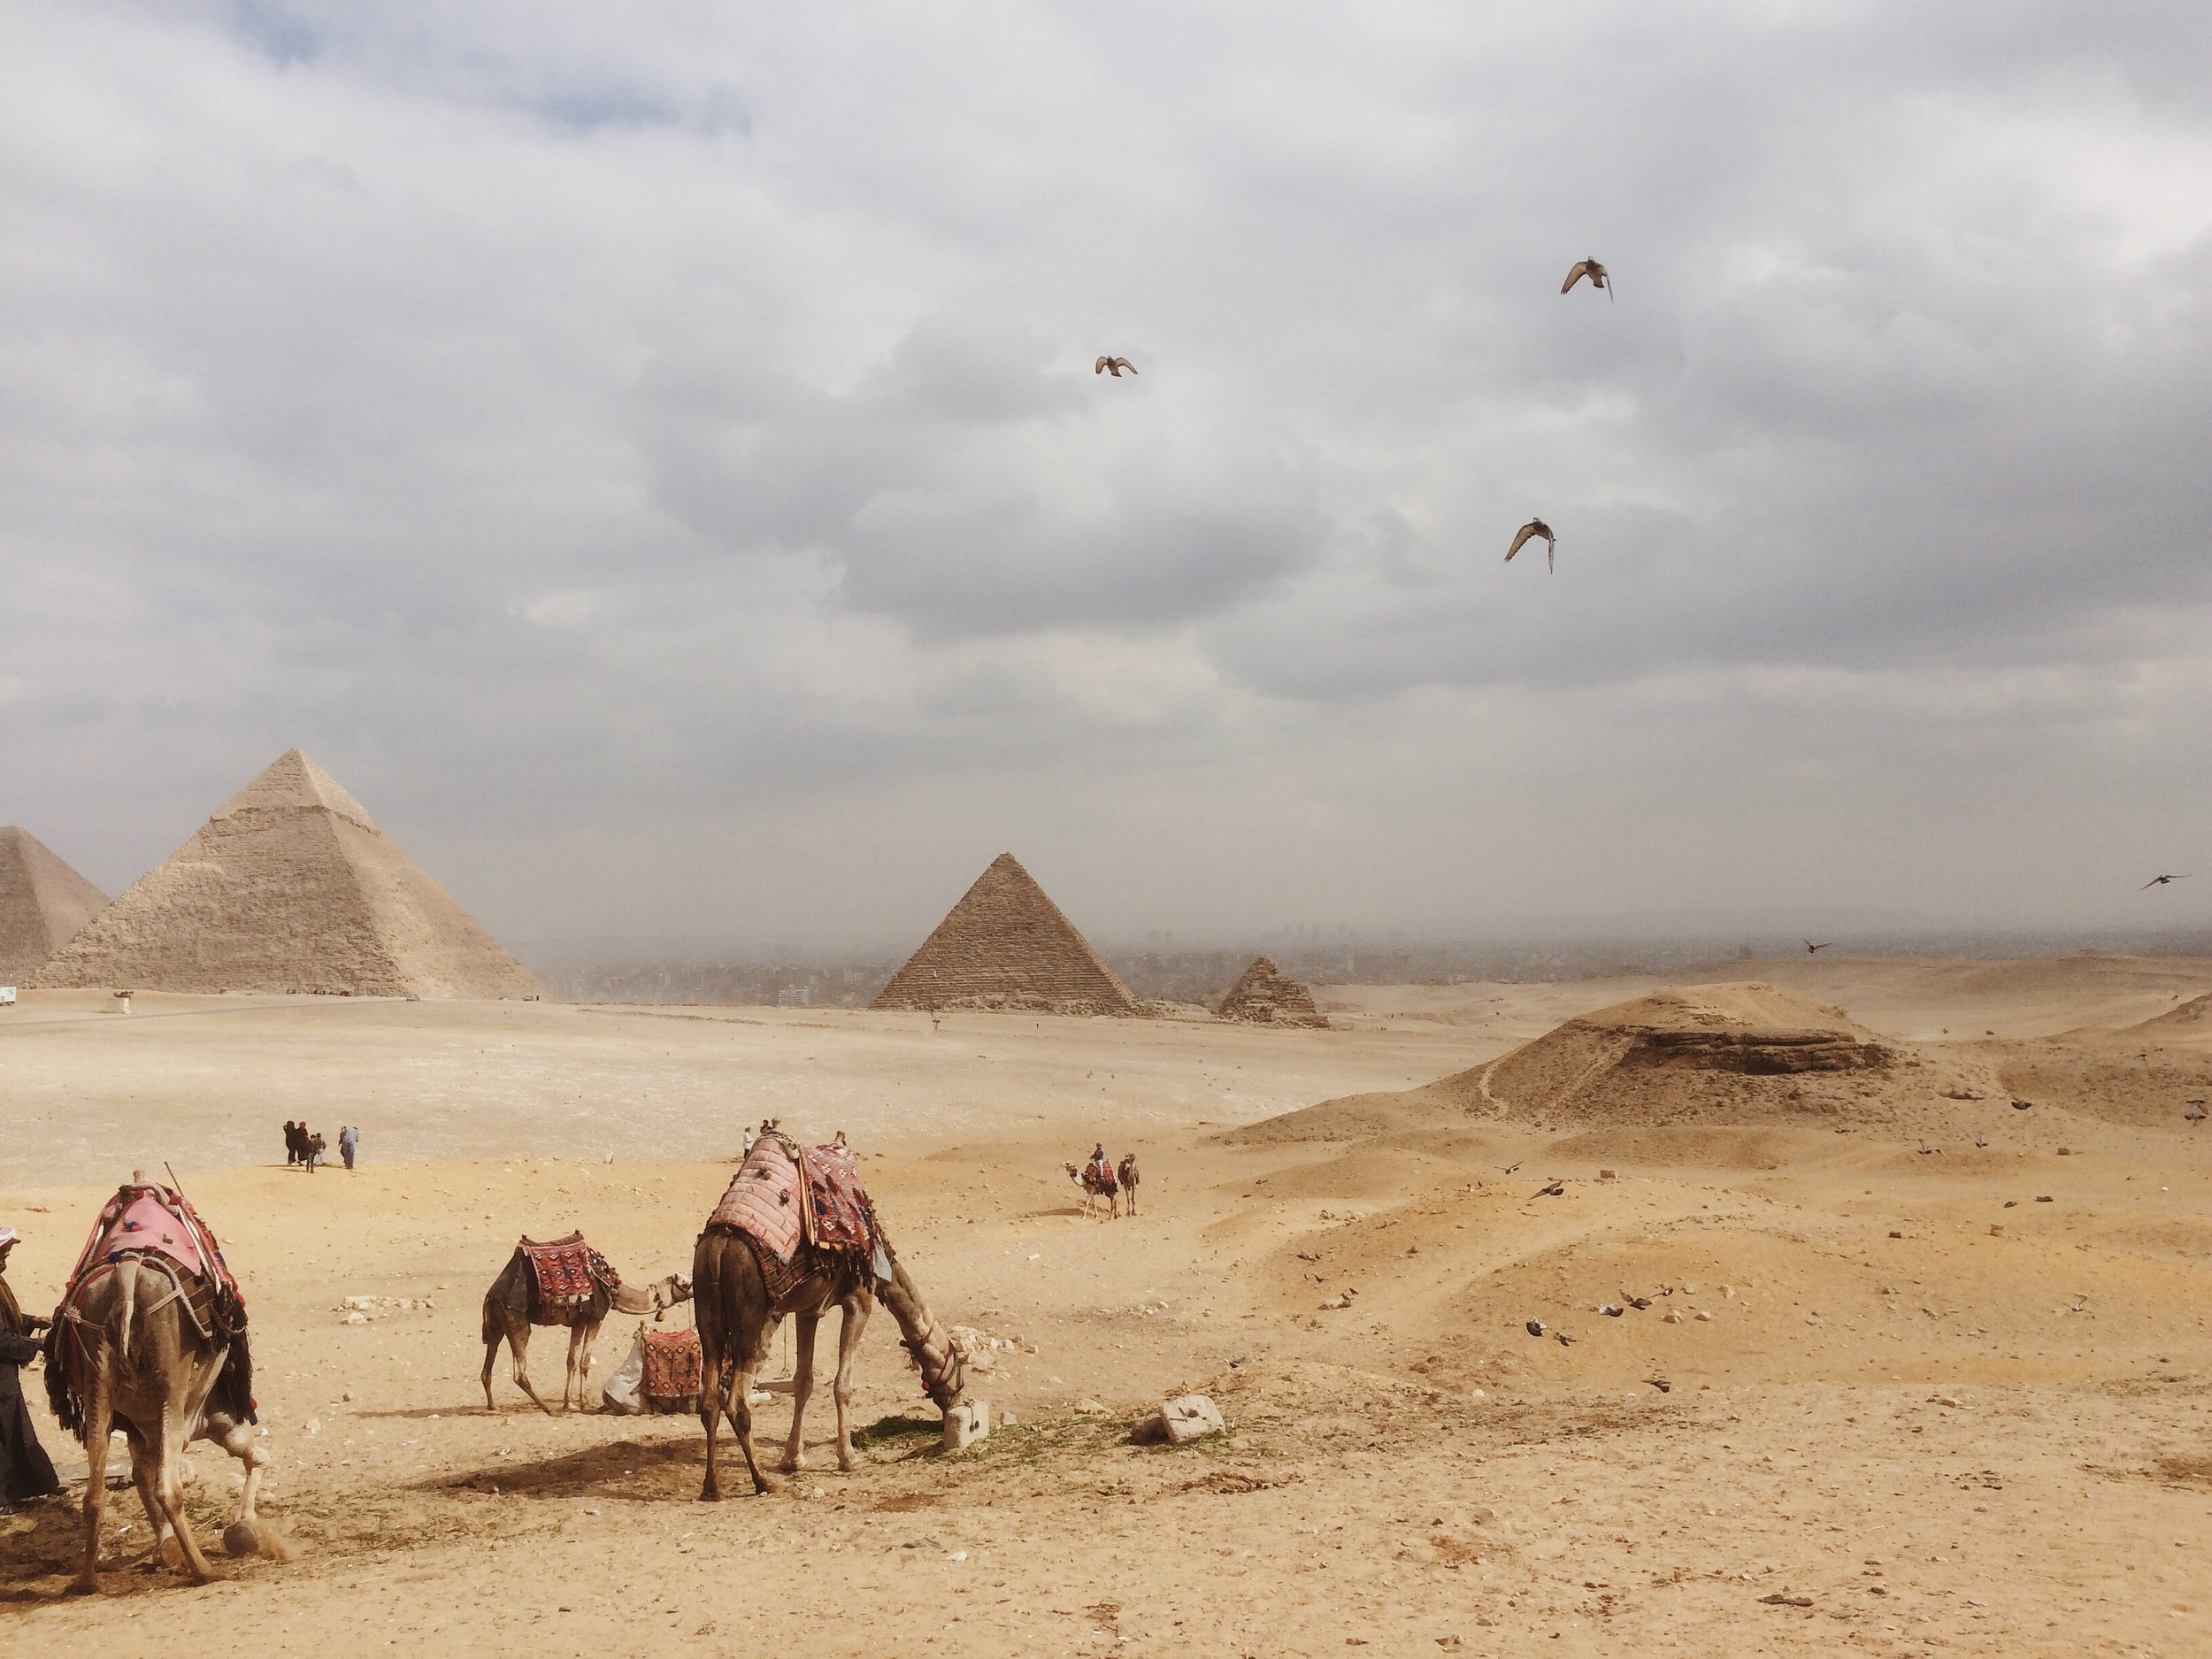 Camels_Pyramids_Egypt_2017.JPG